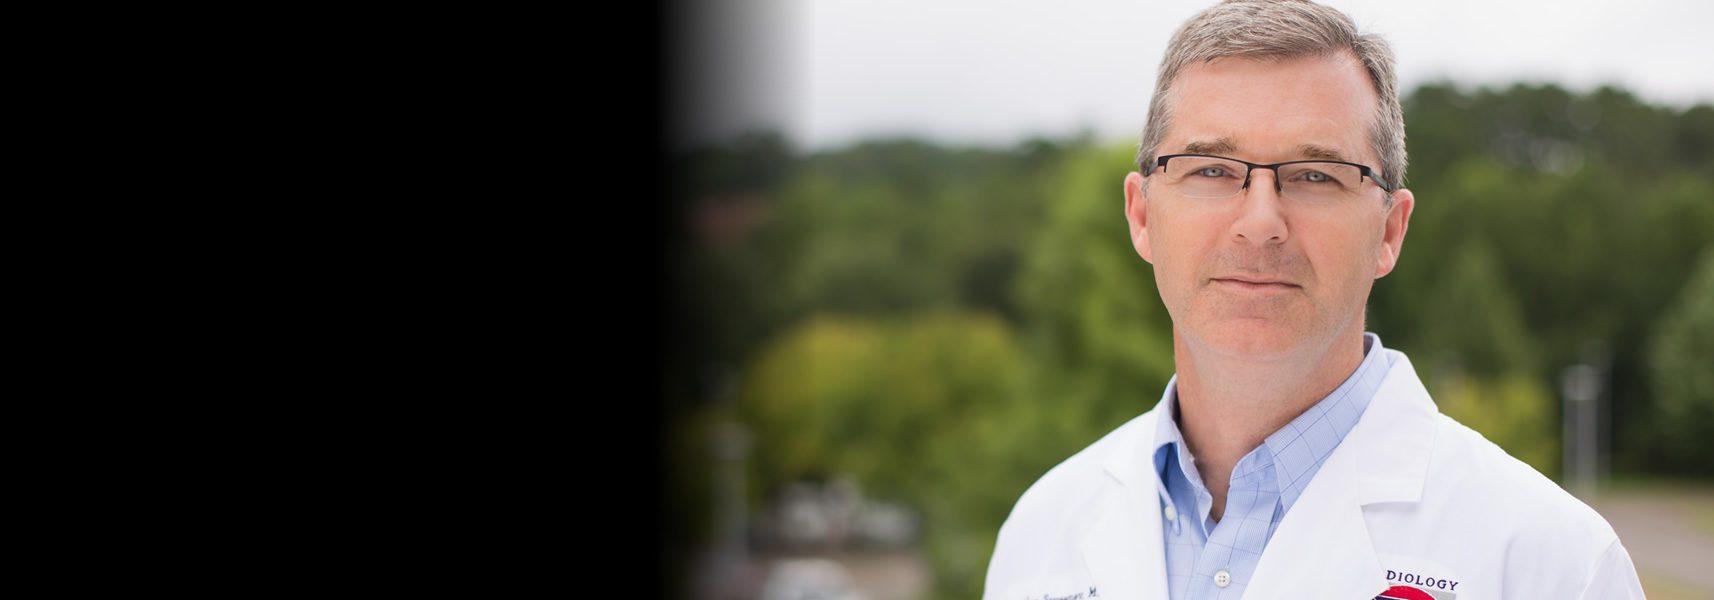 Timothy J  Sweeney, MD - Radiology Associates of Tallahassee